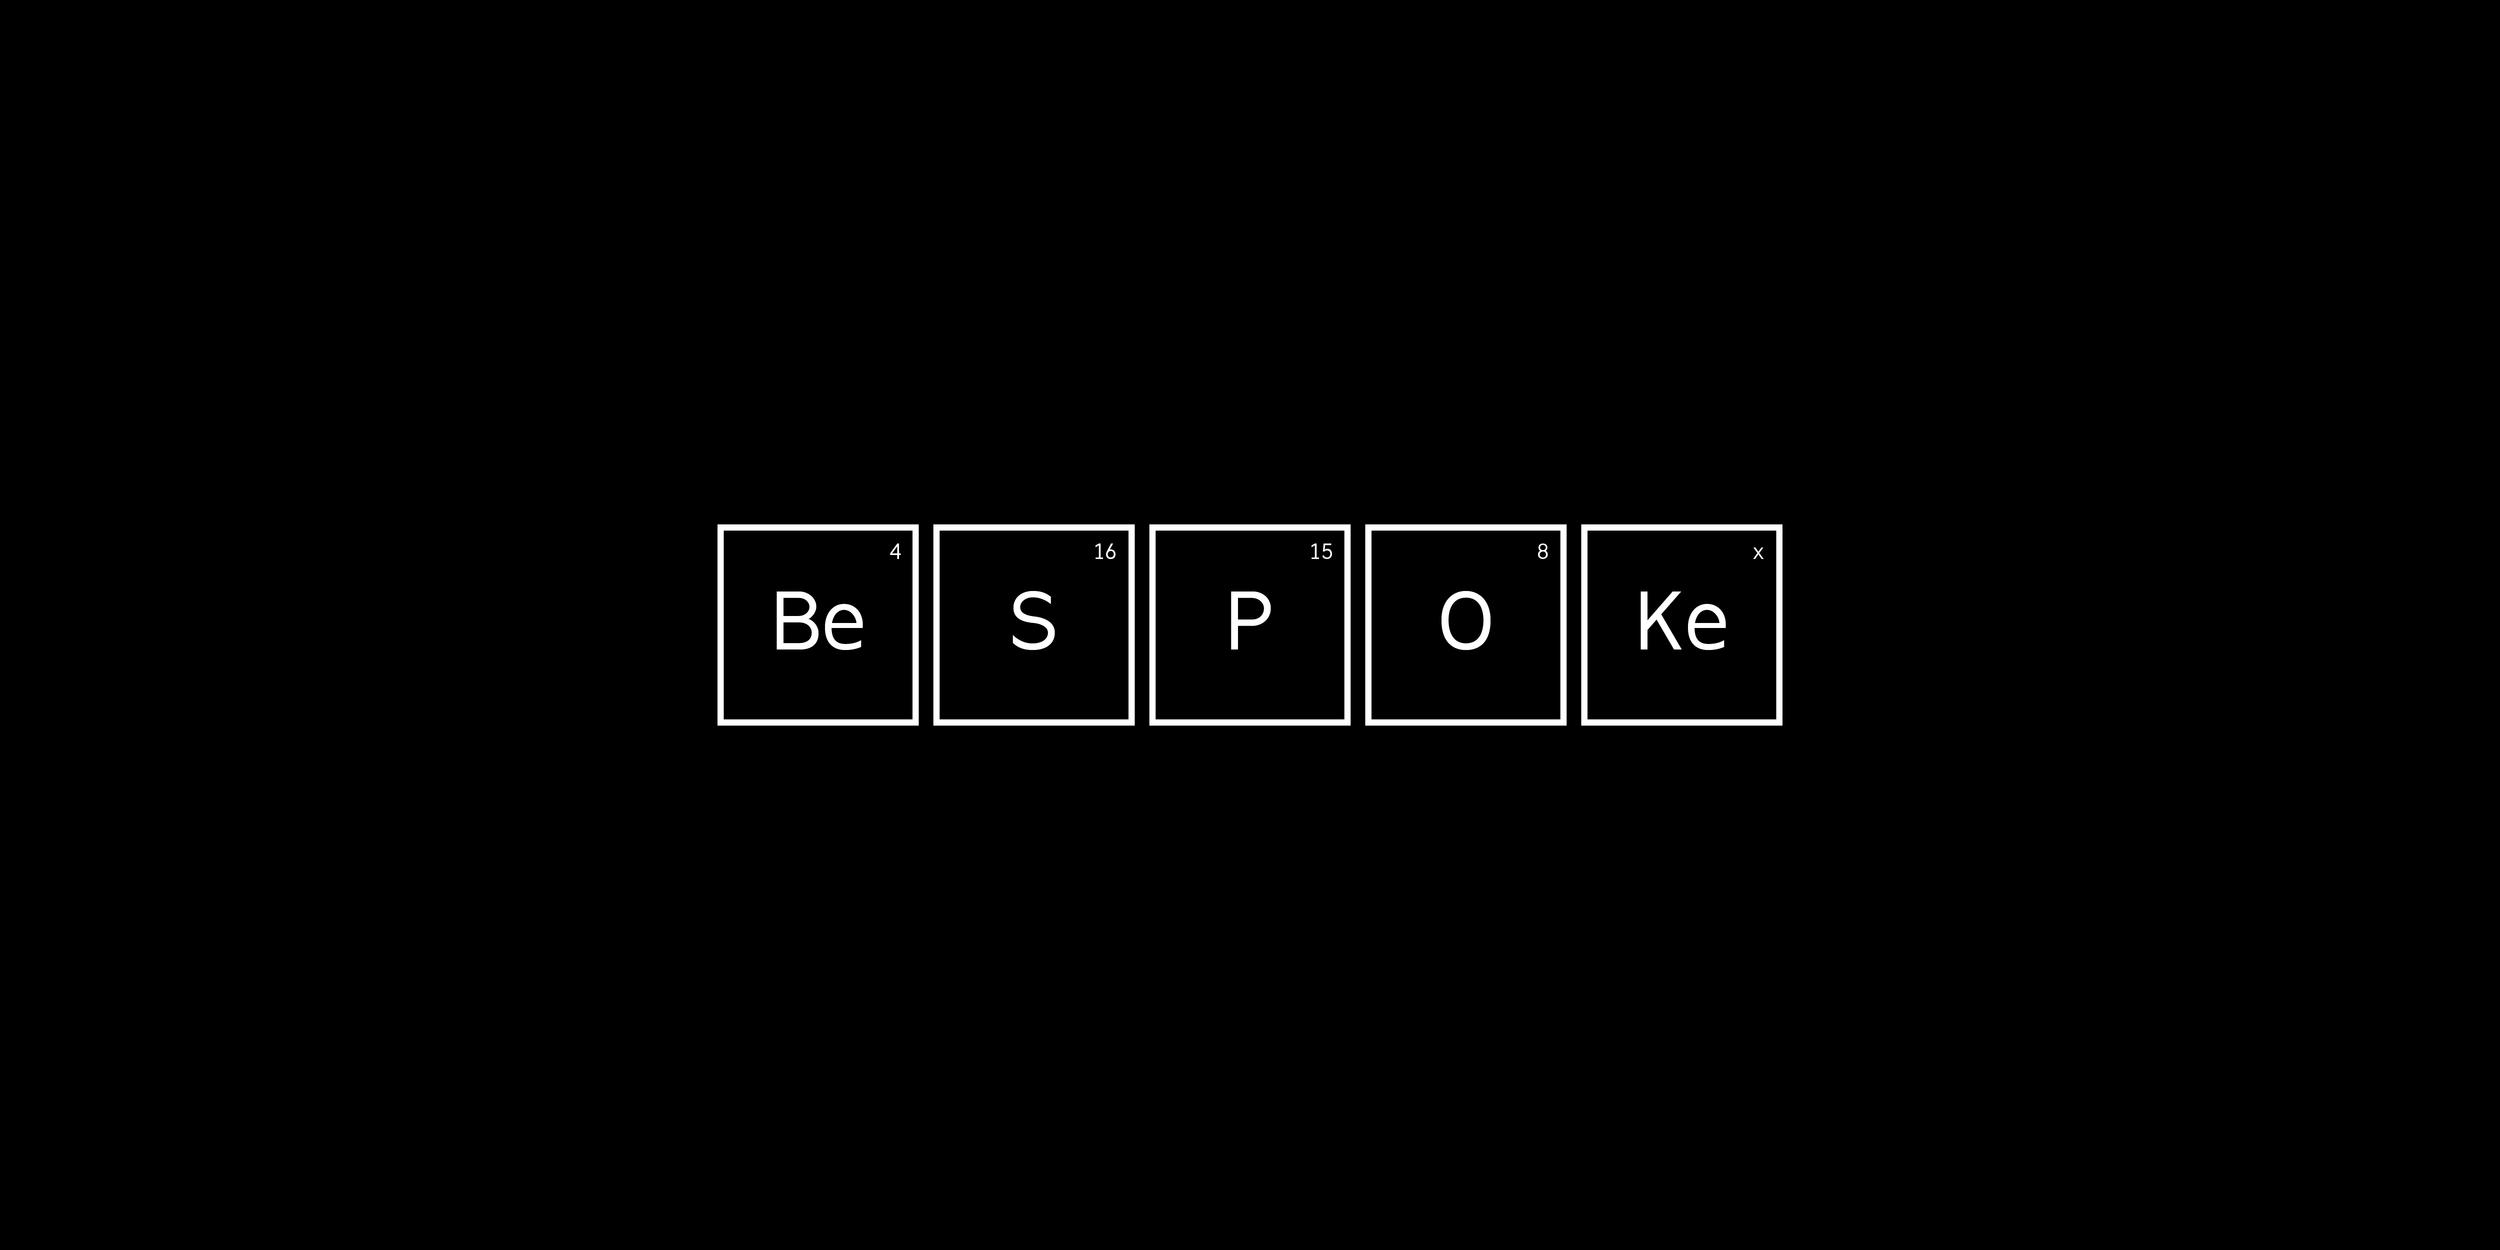 BeSPOKE.png